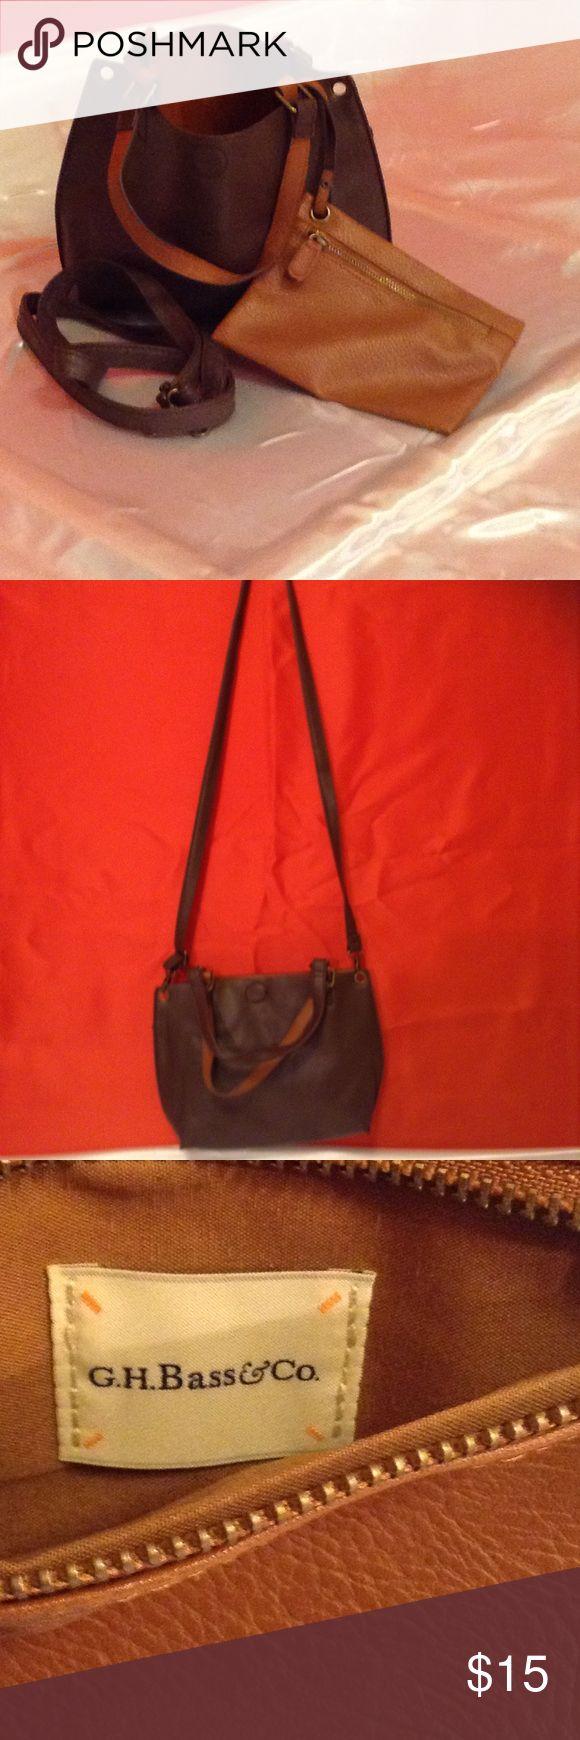 Brown G H Bass Handbag G H Bass bag can be carried as a Crossbody or a handbag, has a small removable pouch bag Bags Crossbody Bags